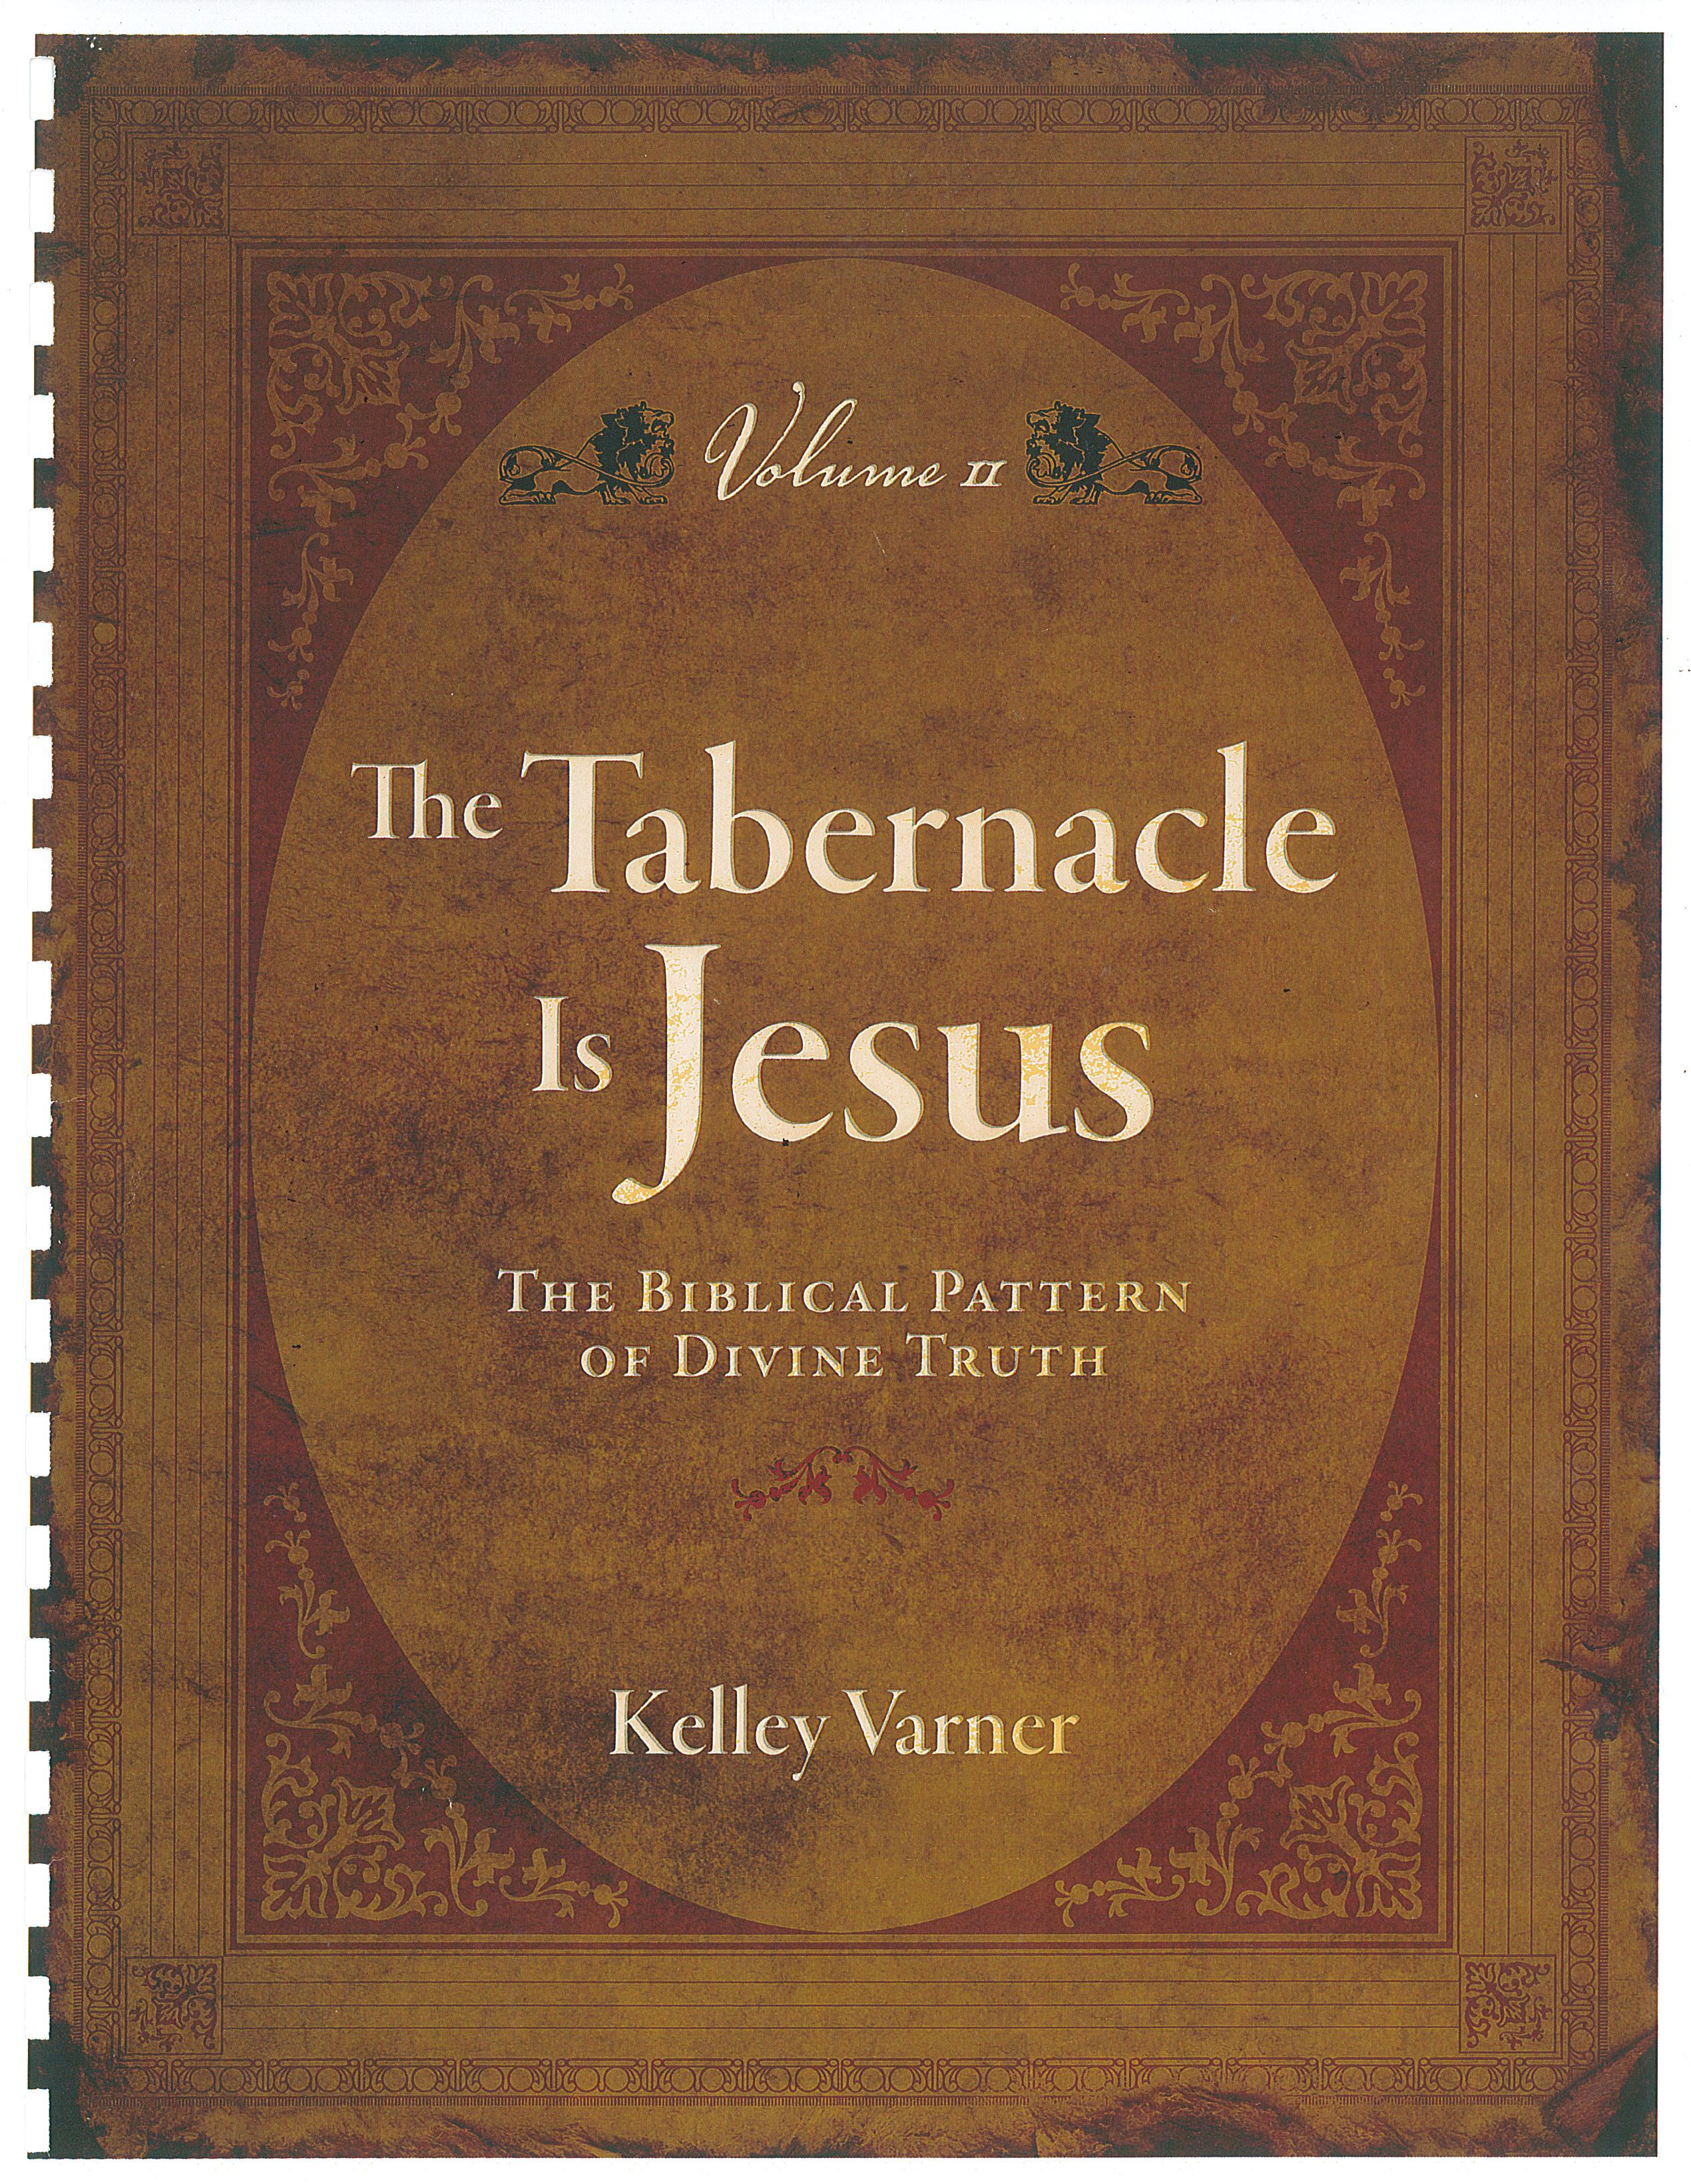 The Tabernacle Is Jesus